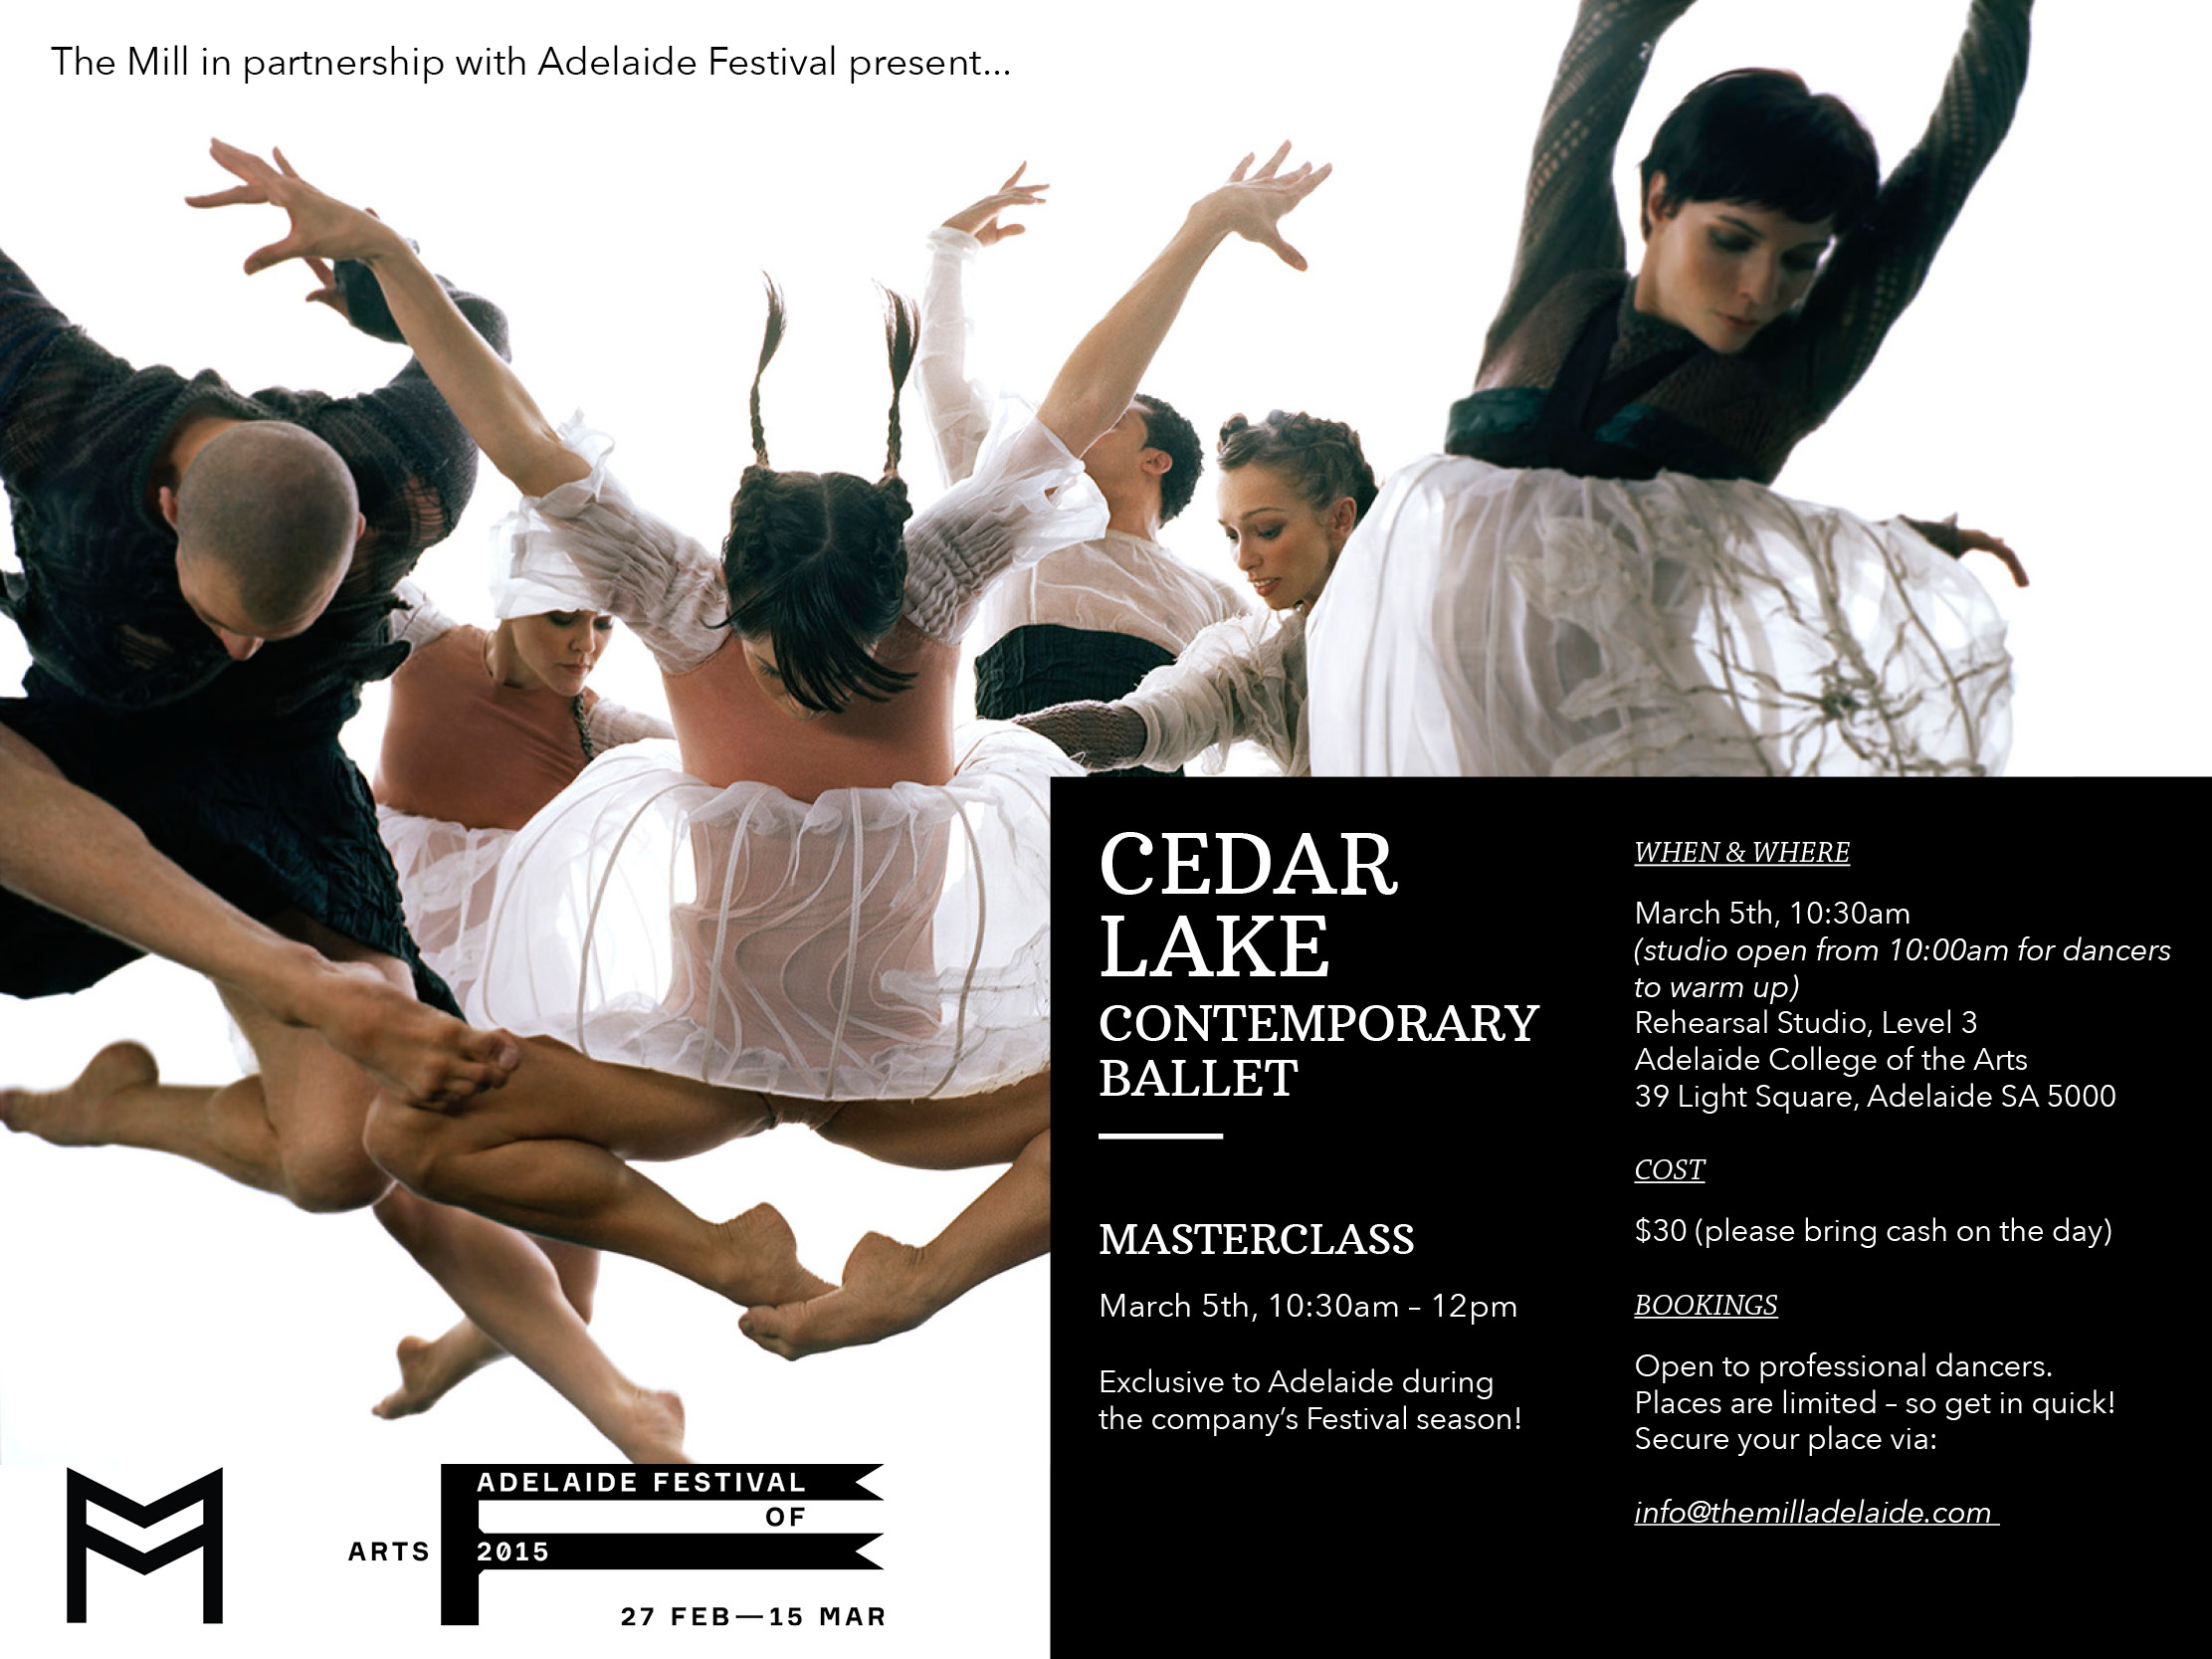 Cedar Lake ballet masterclass flyer.jpg